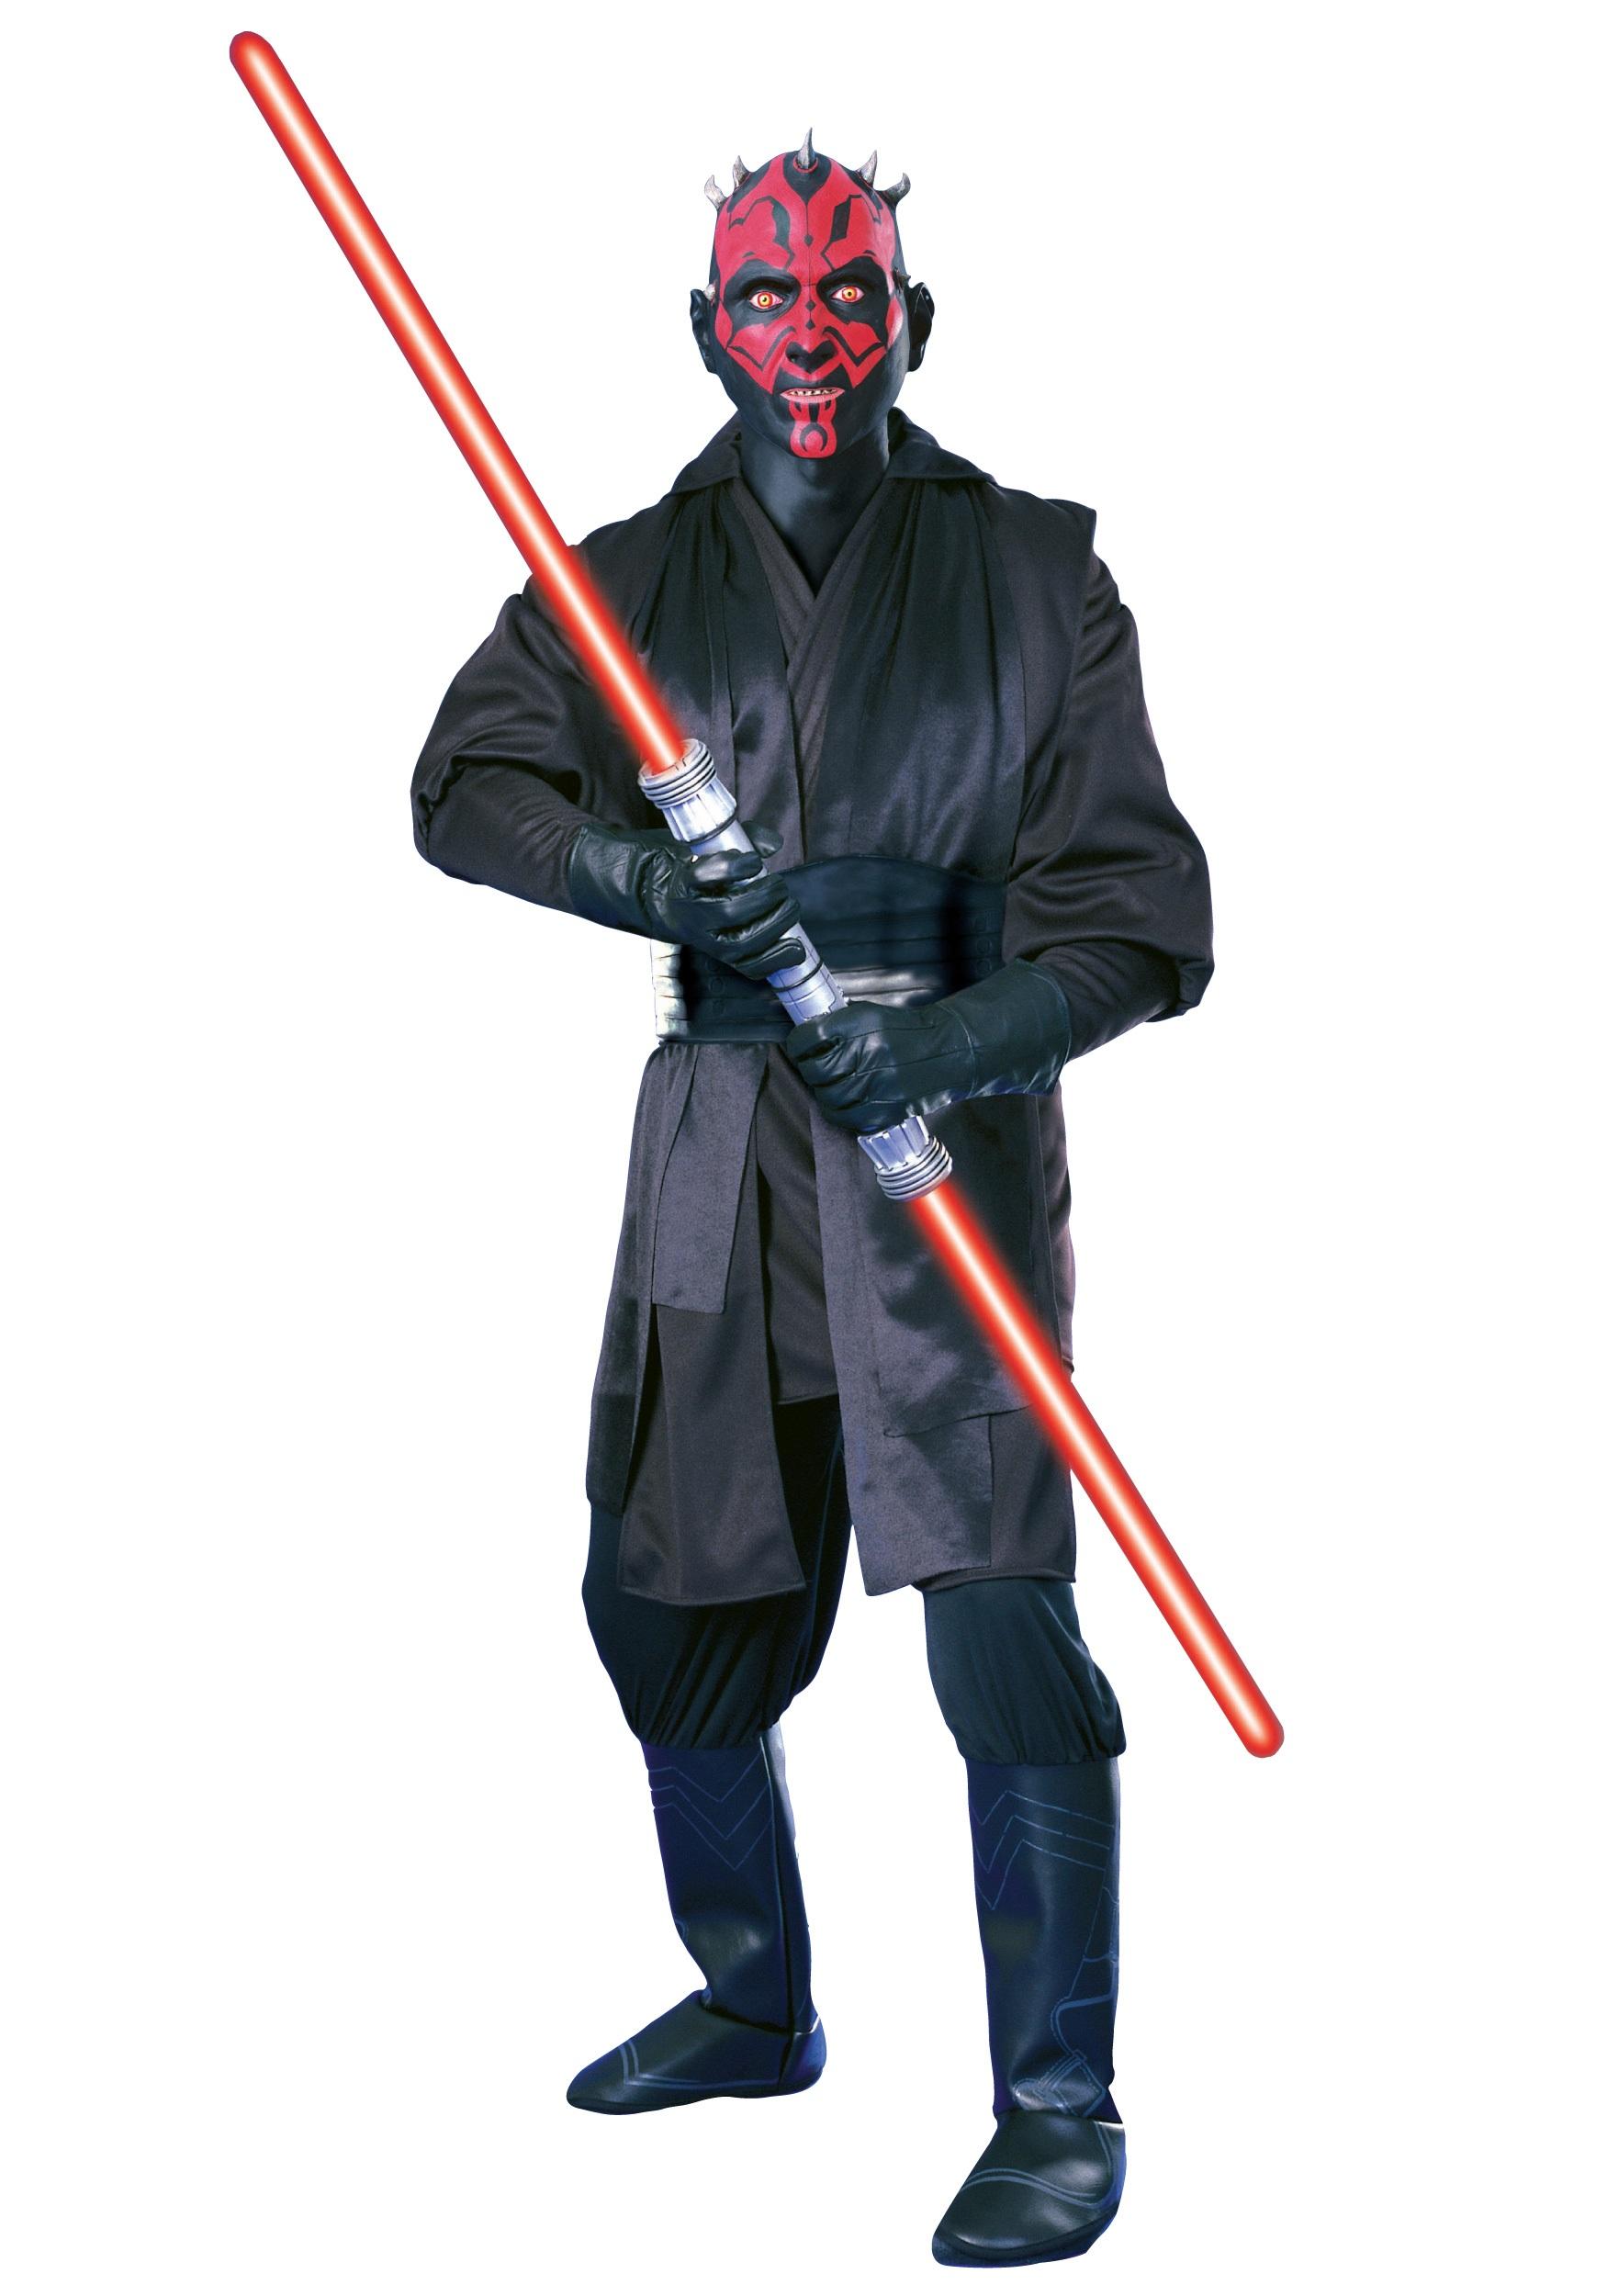 Super Deluxe Adult Darth Maul Costume - Star Wars Halloween Costume